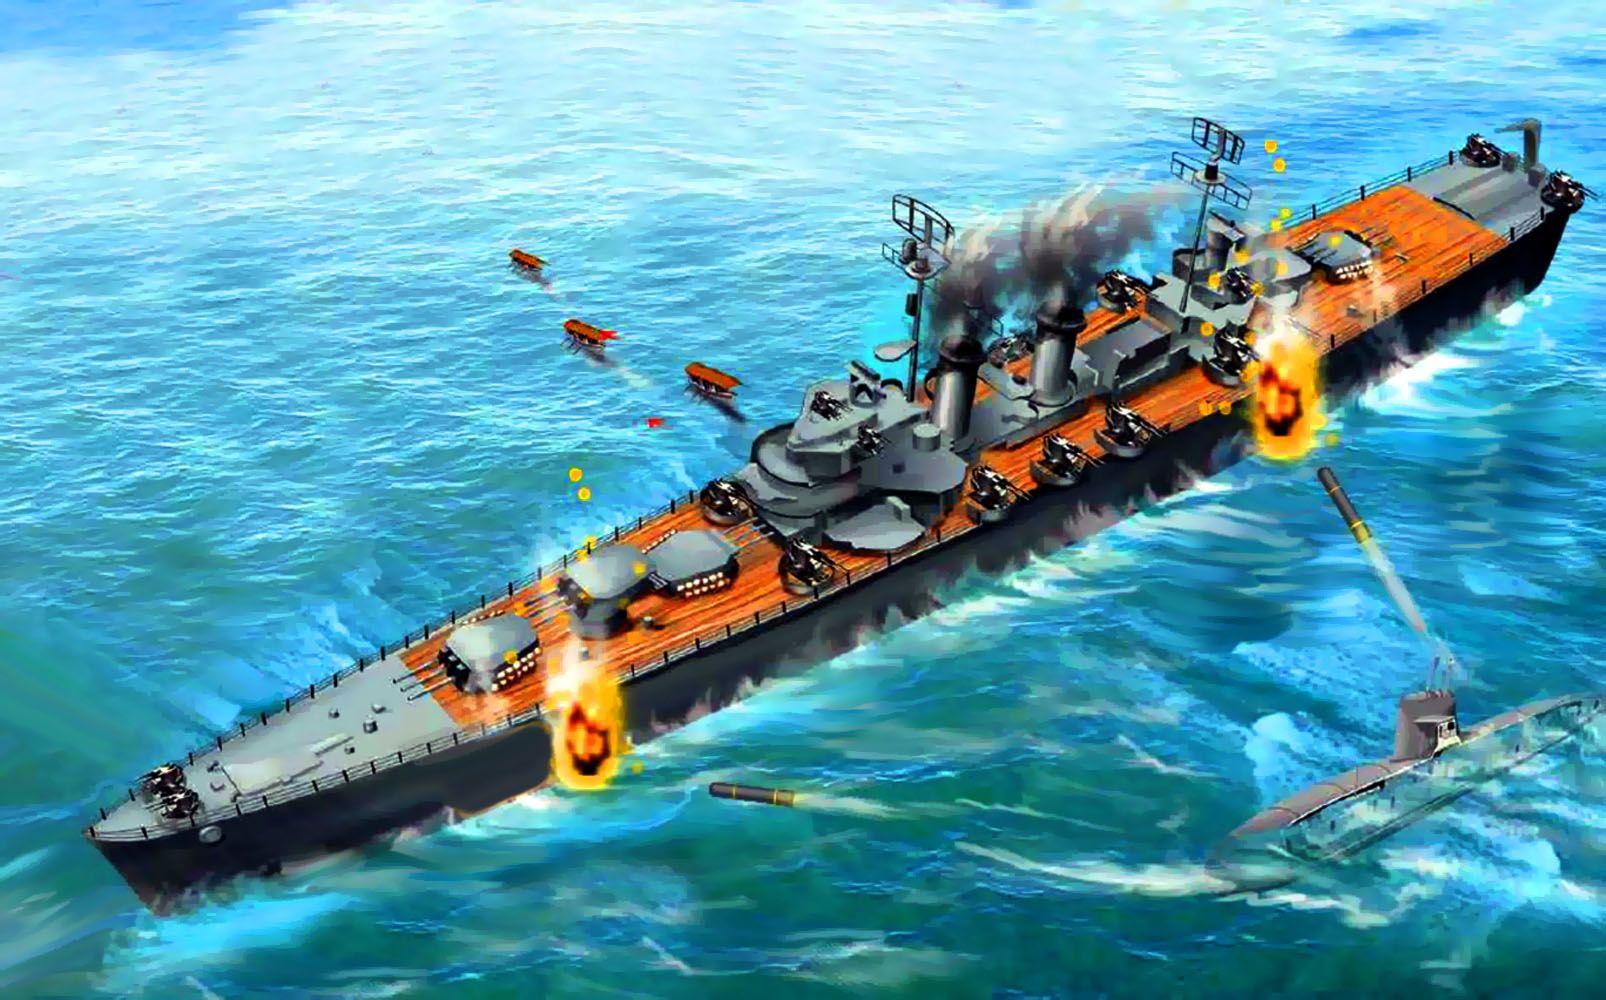 Sinking of ARA General Belgrano by British nuclear submarine